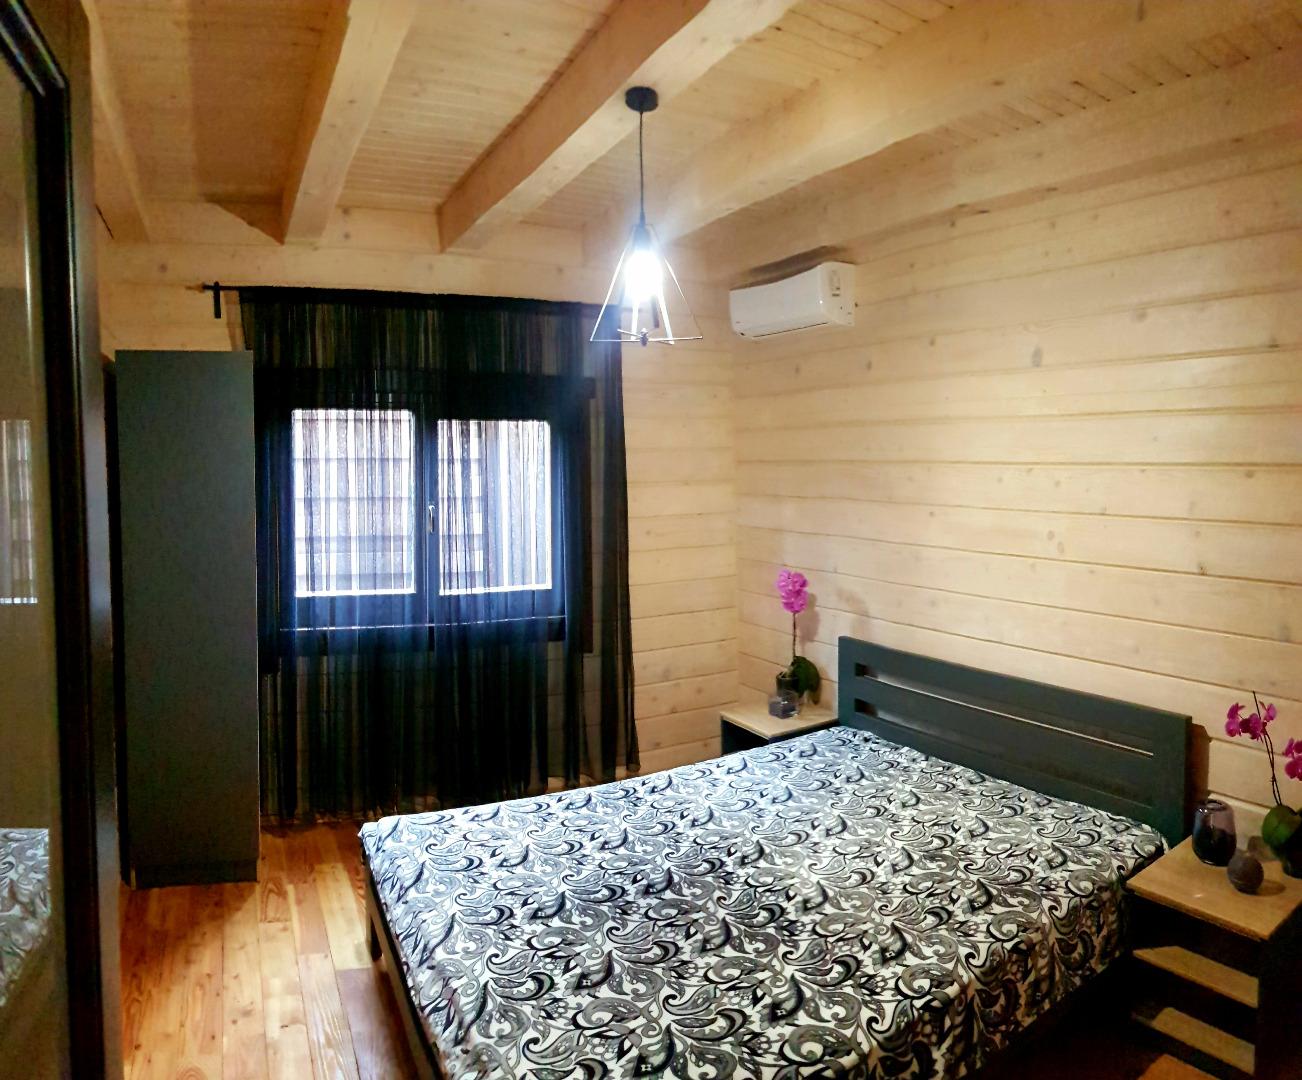 продажа дома номер H-119135 в Санжейке, фото номер 19